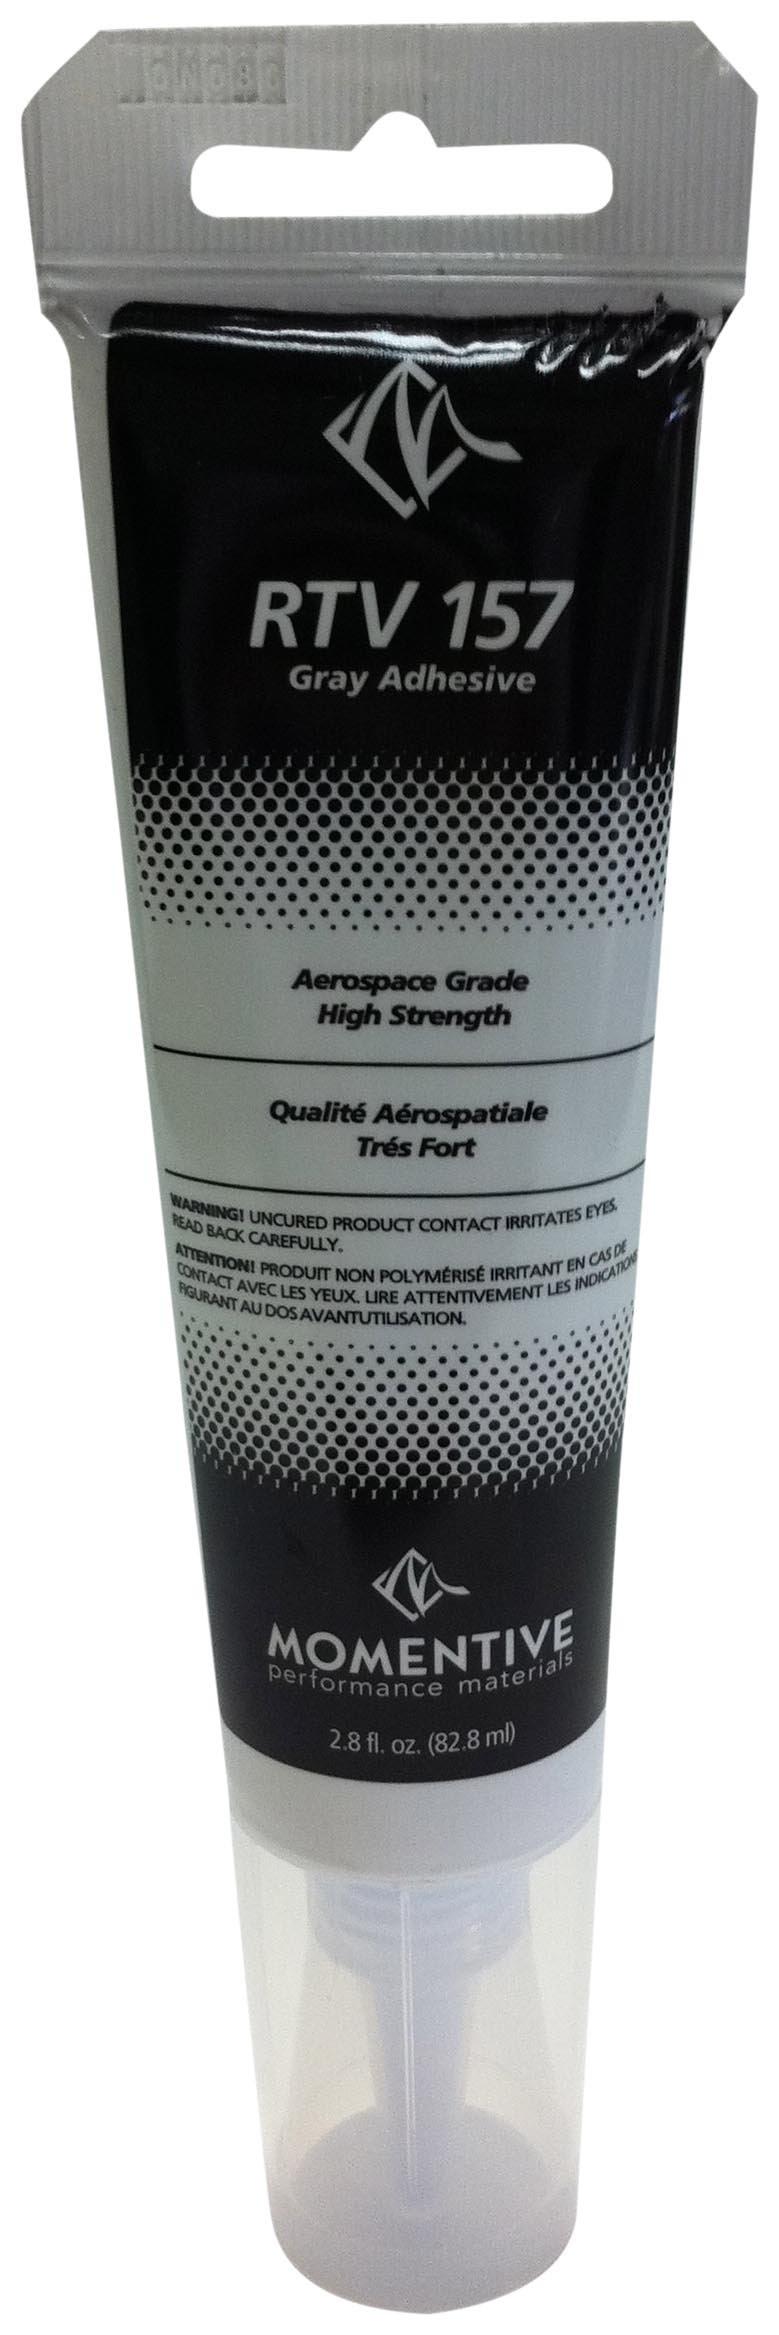 Momentive RTV 157 One Part Silicone Sealant, 2.8 Ounce Tube, Gray